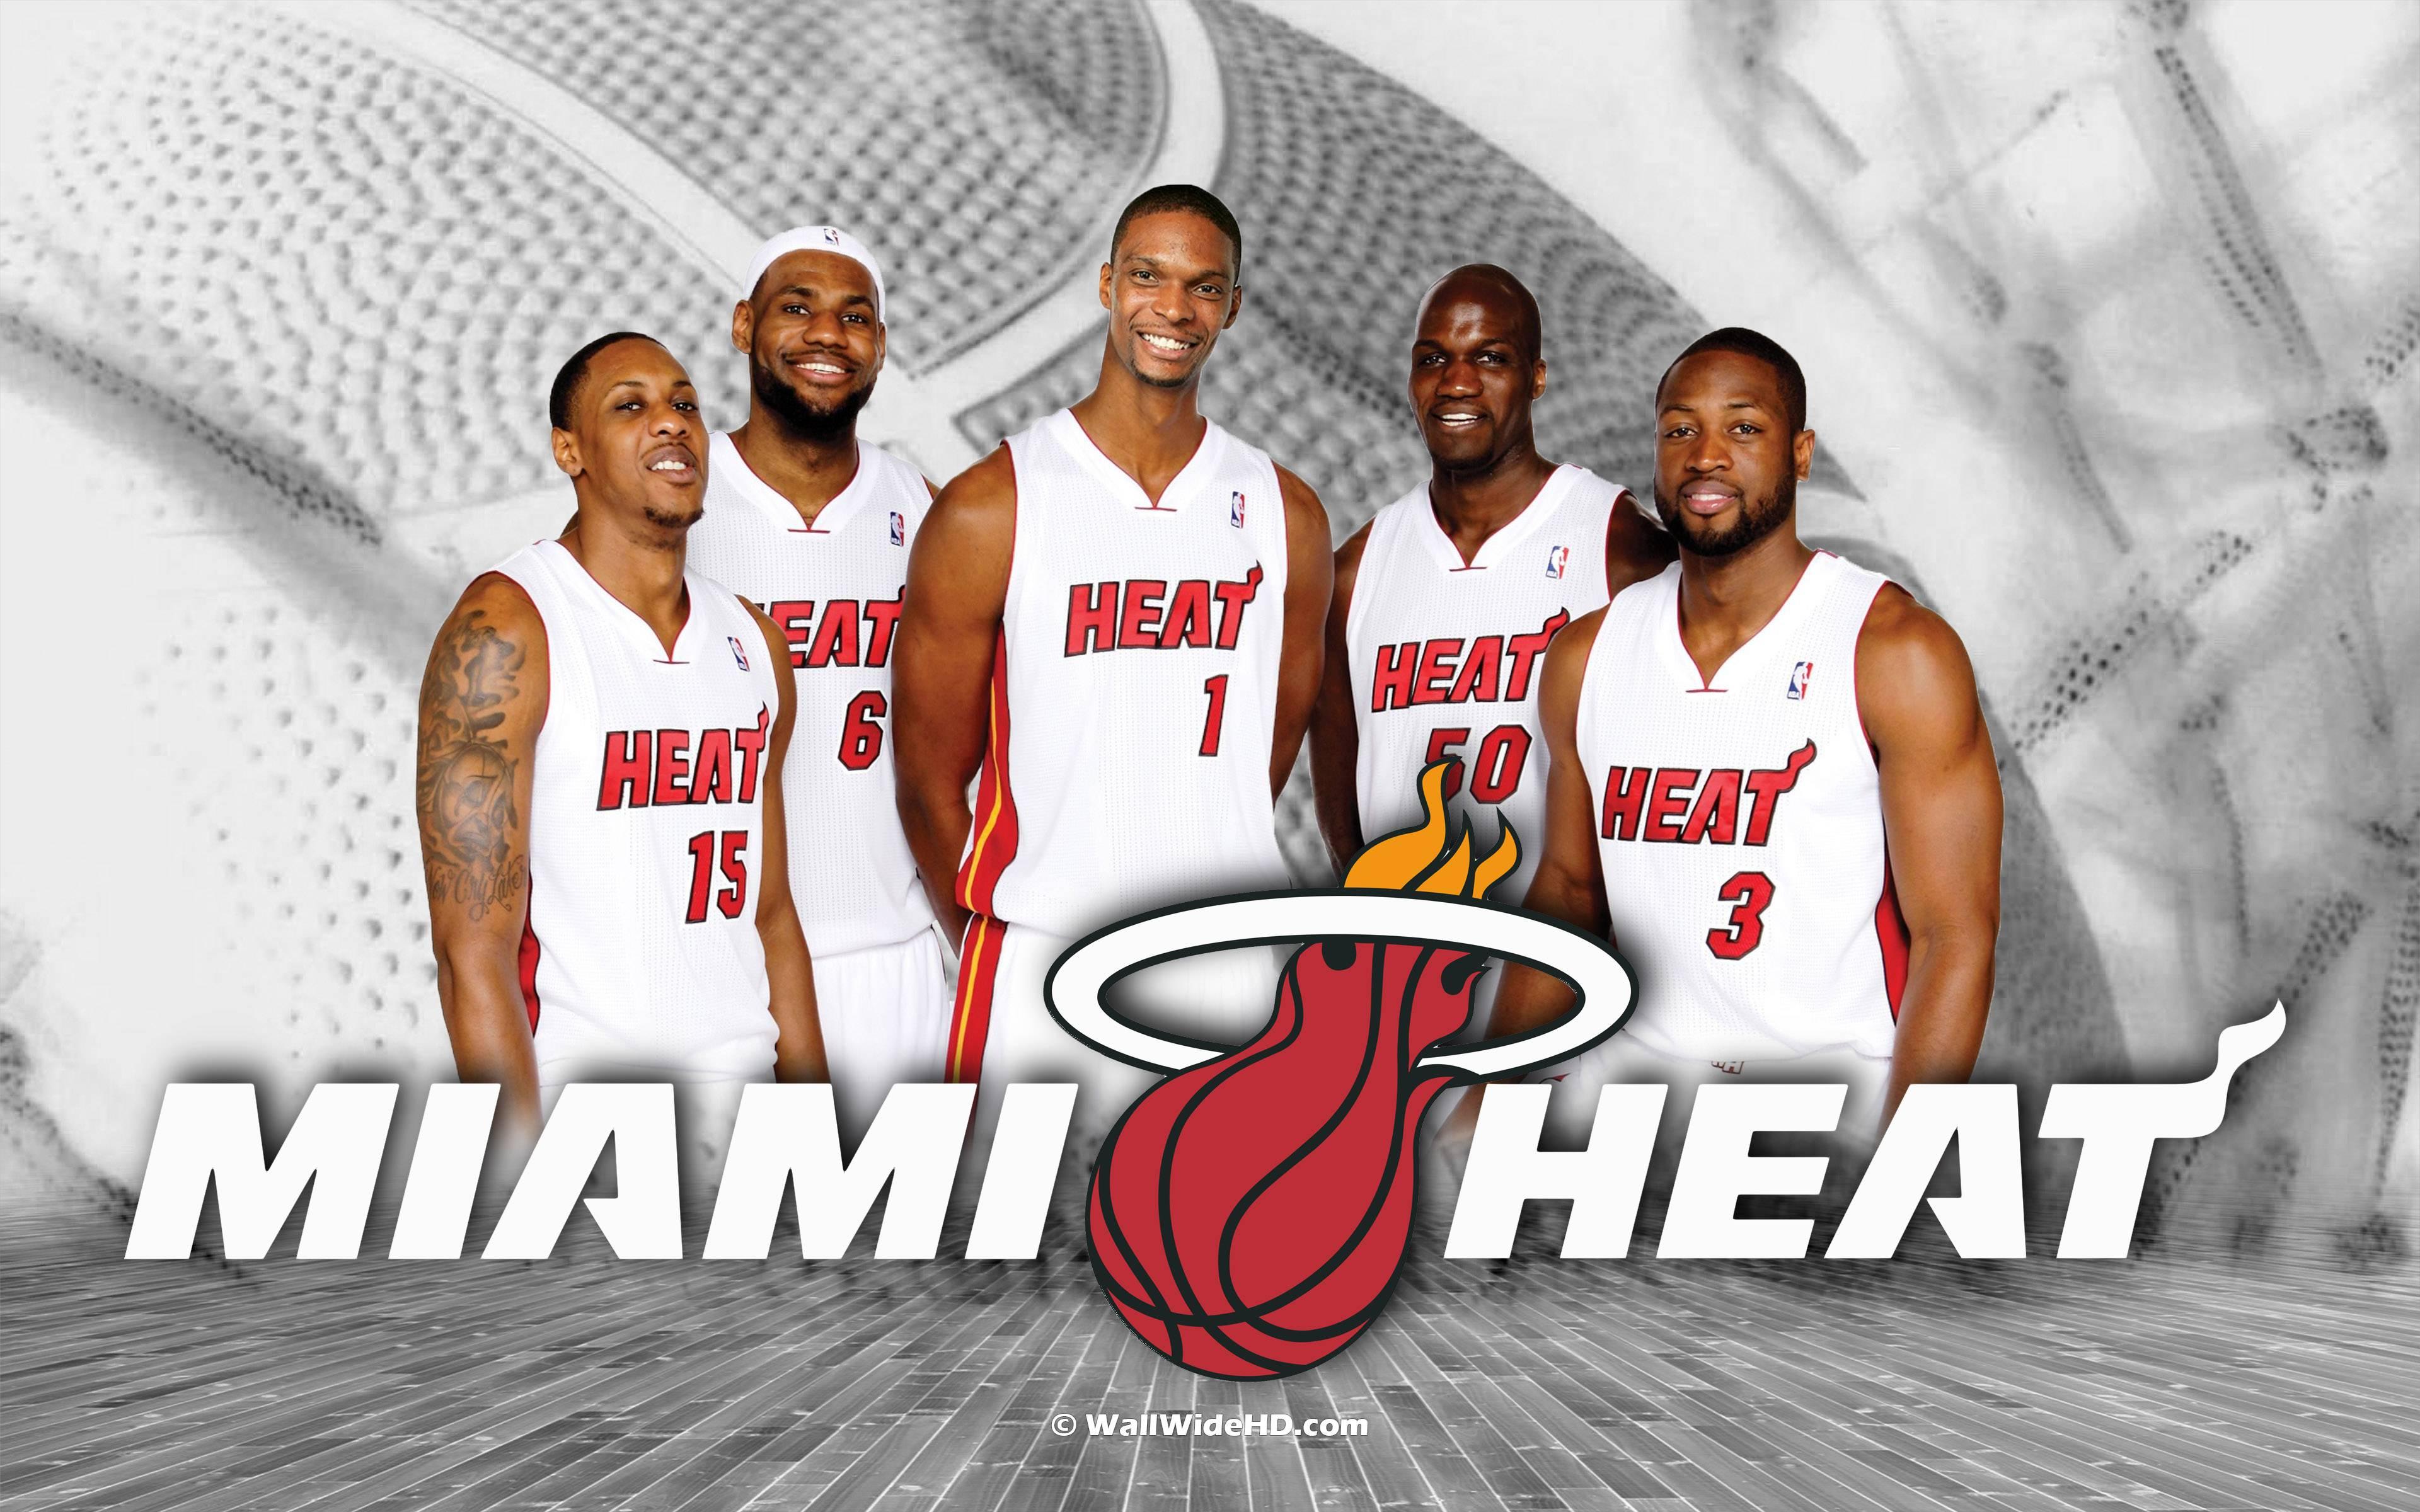 Miami Heat Logo Wallpapers 2015 3840x2400